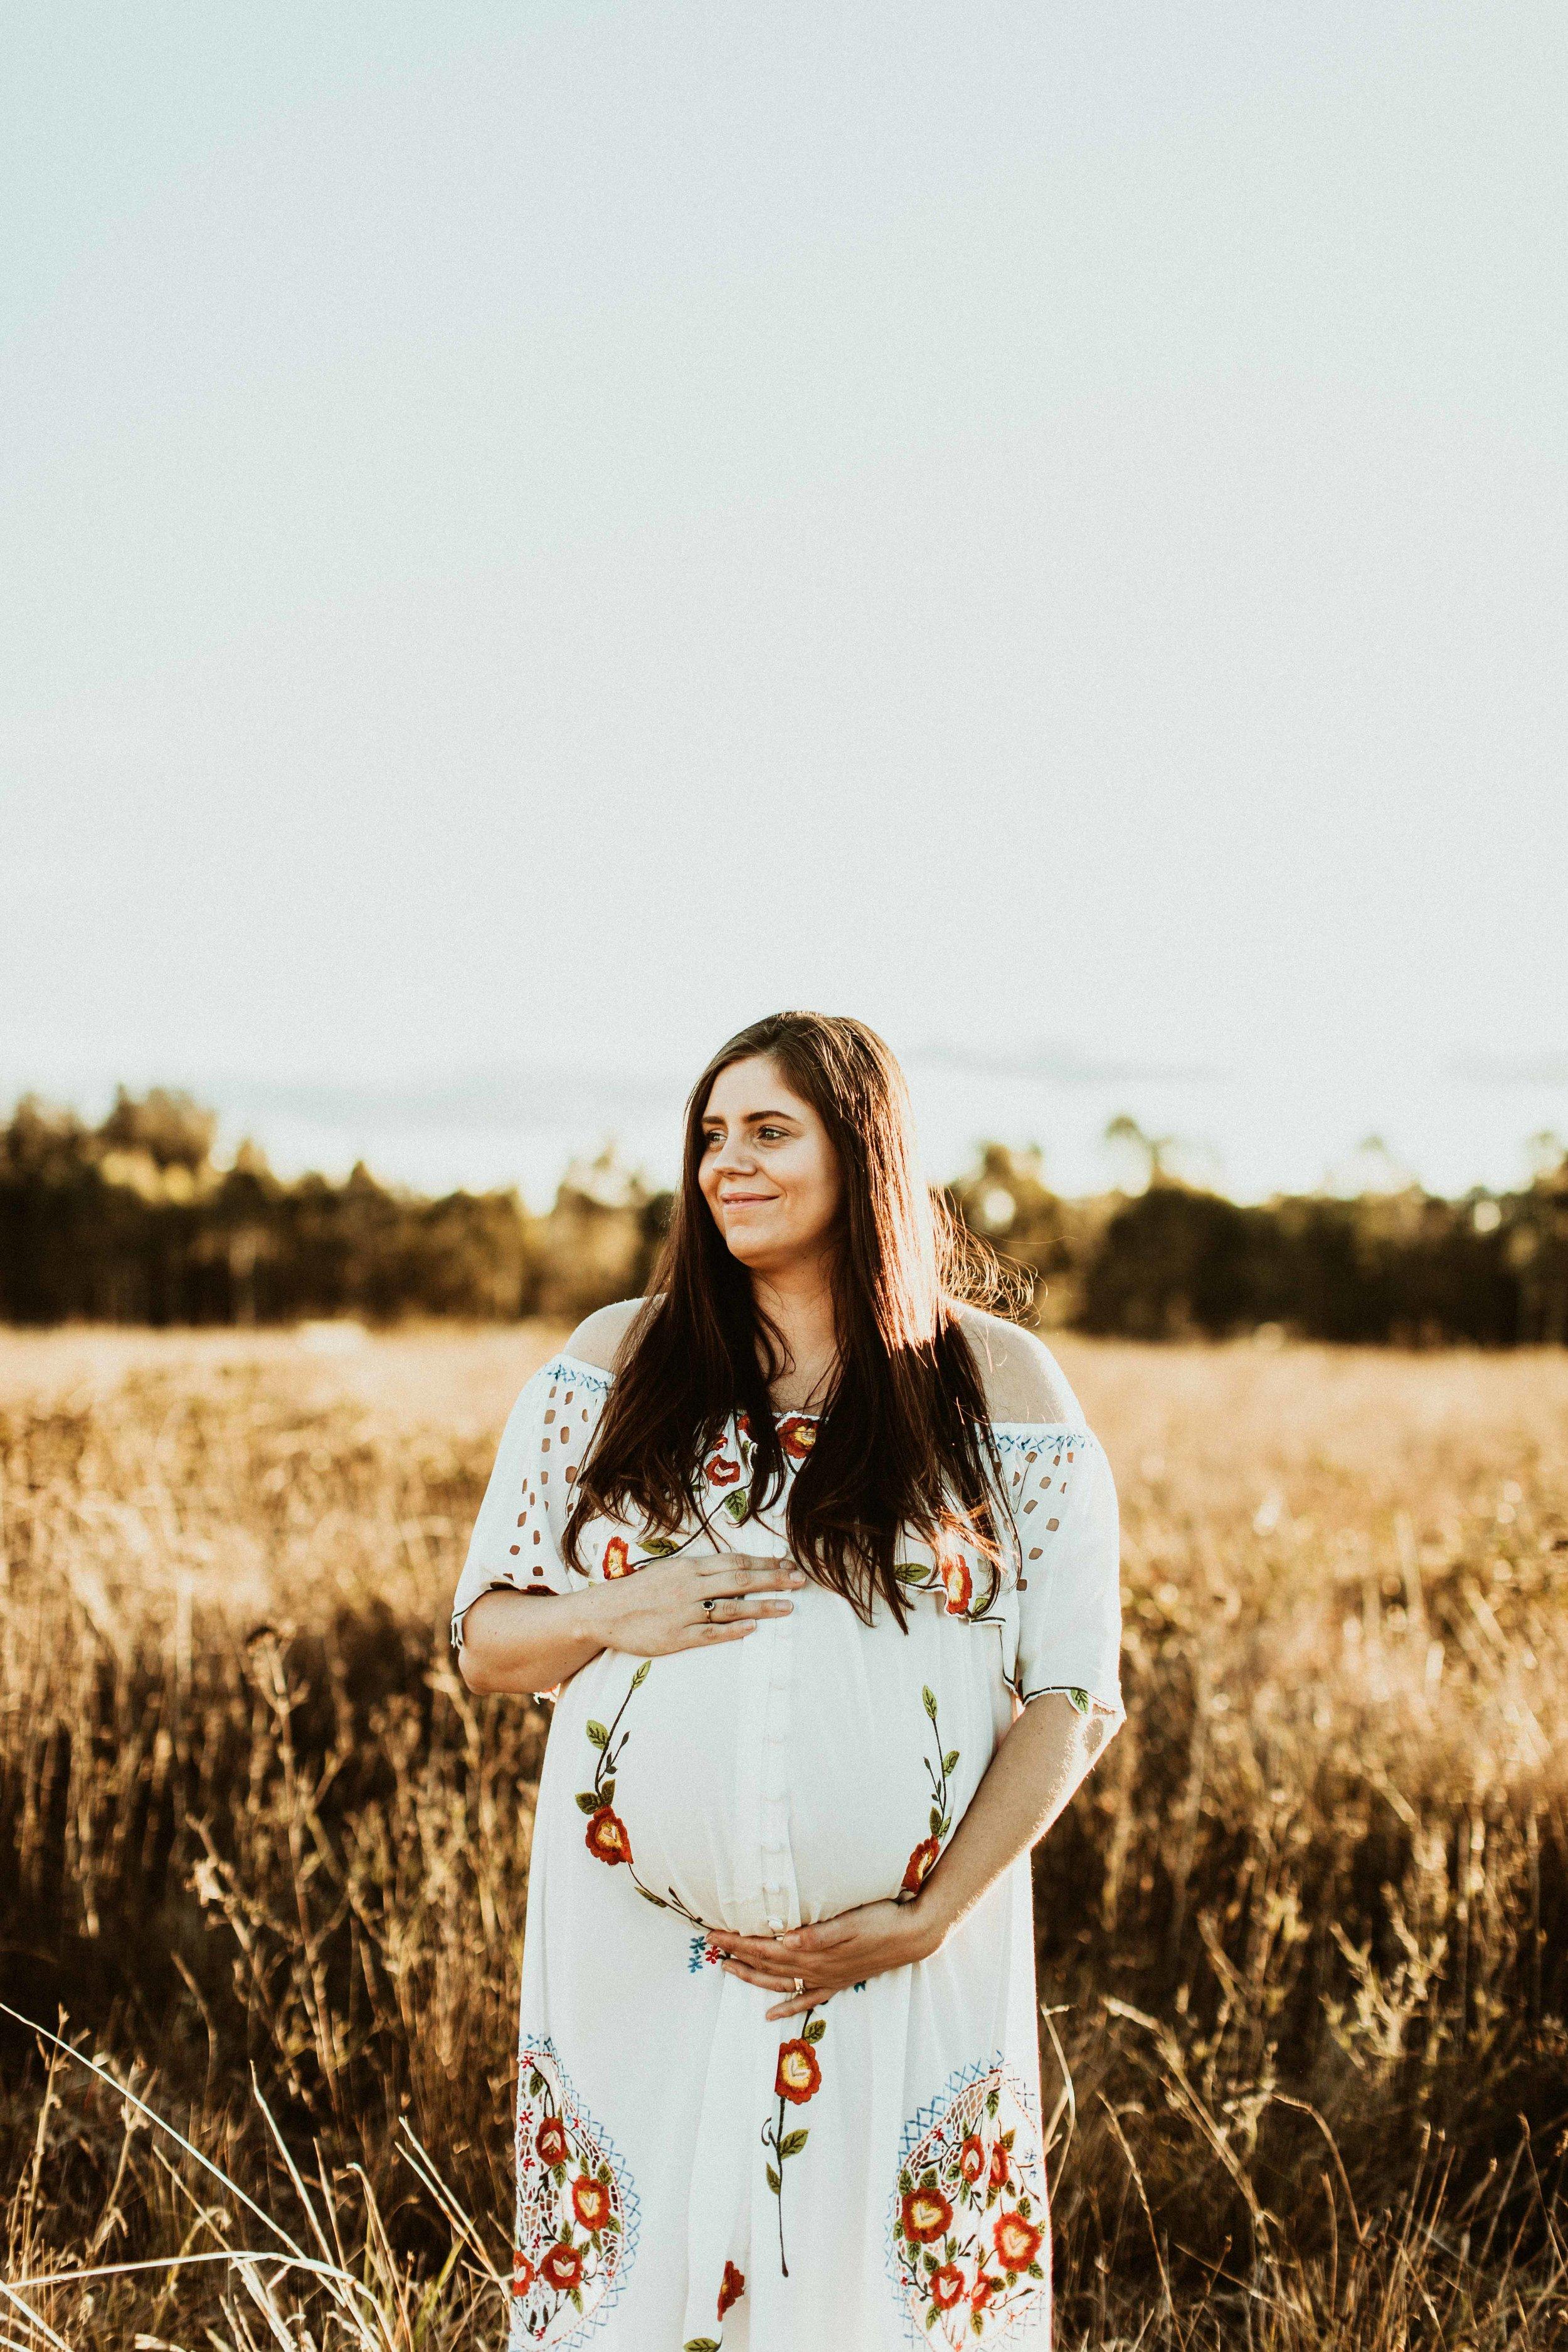 camden-maternity-session-emilyobrienphotography.net-18.jpg